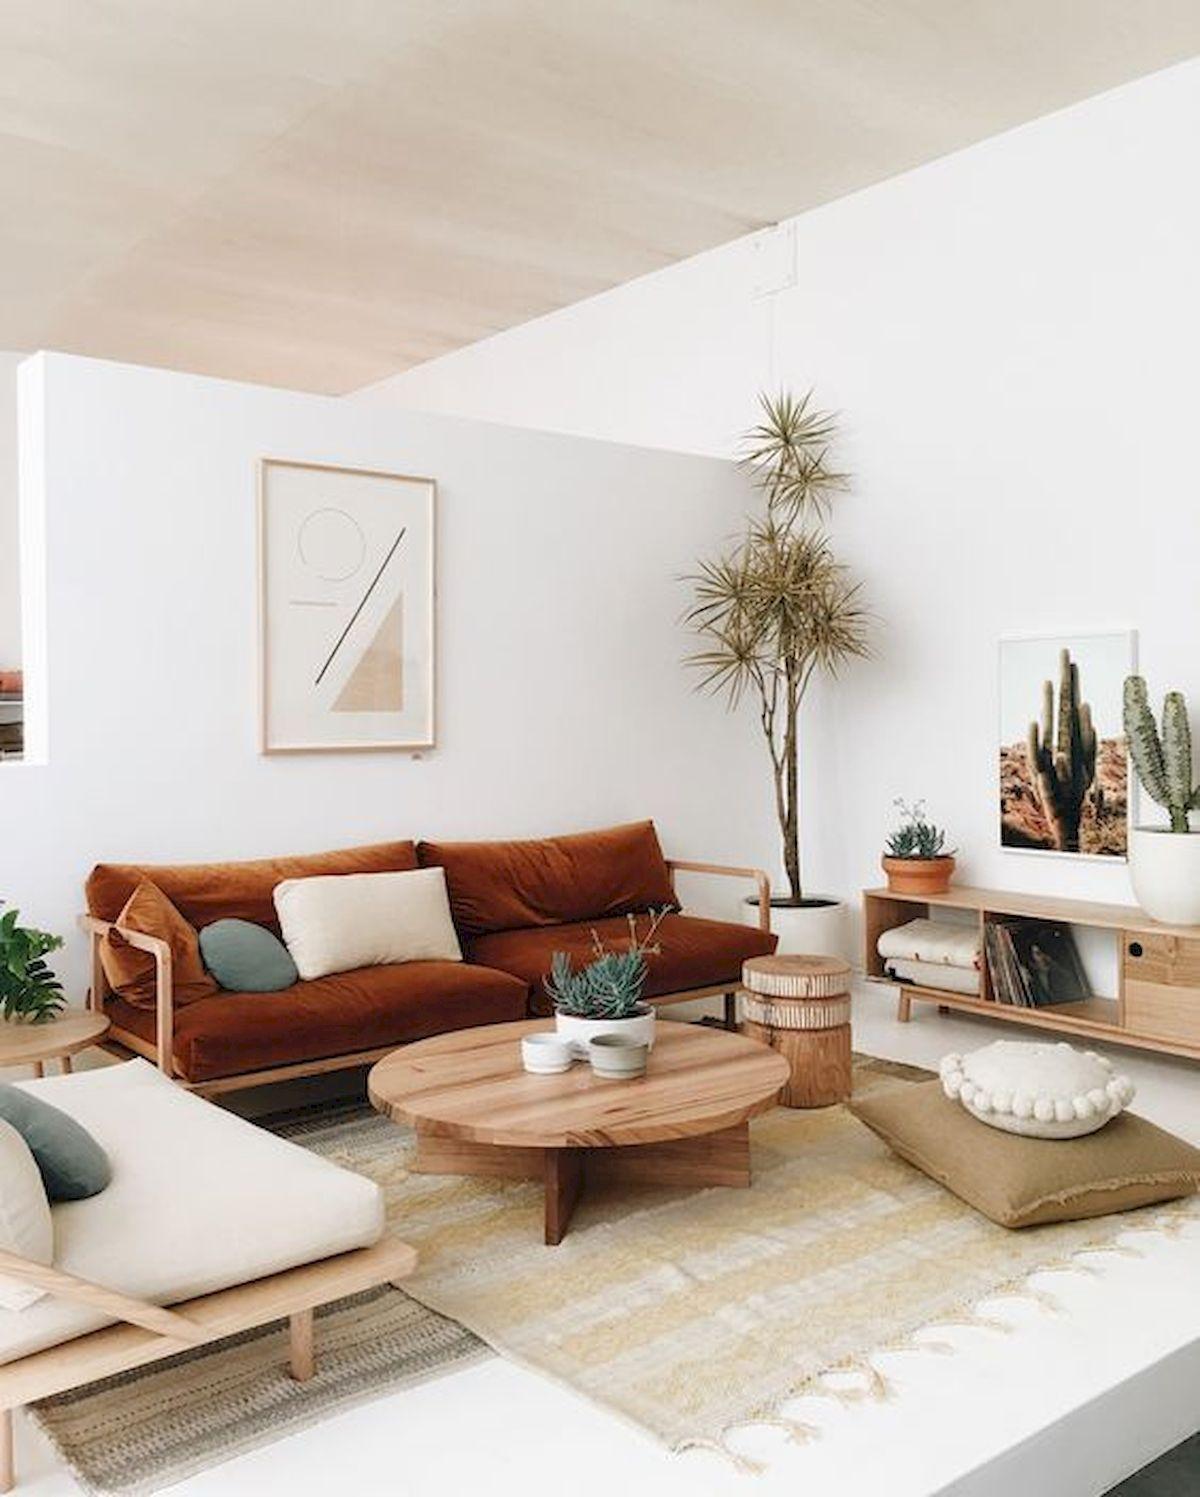 60 living room decor ideas with artwork coffee tables rh pinterest com